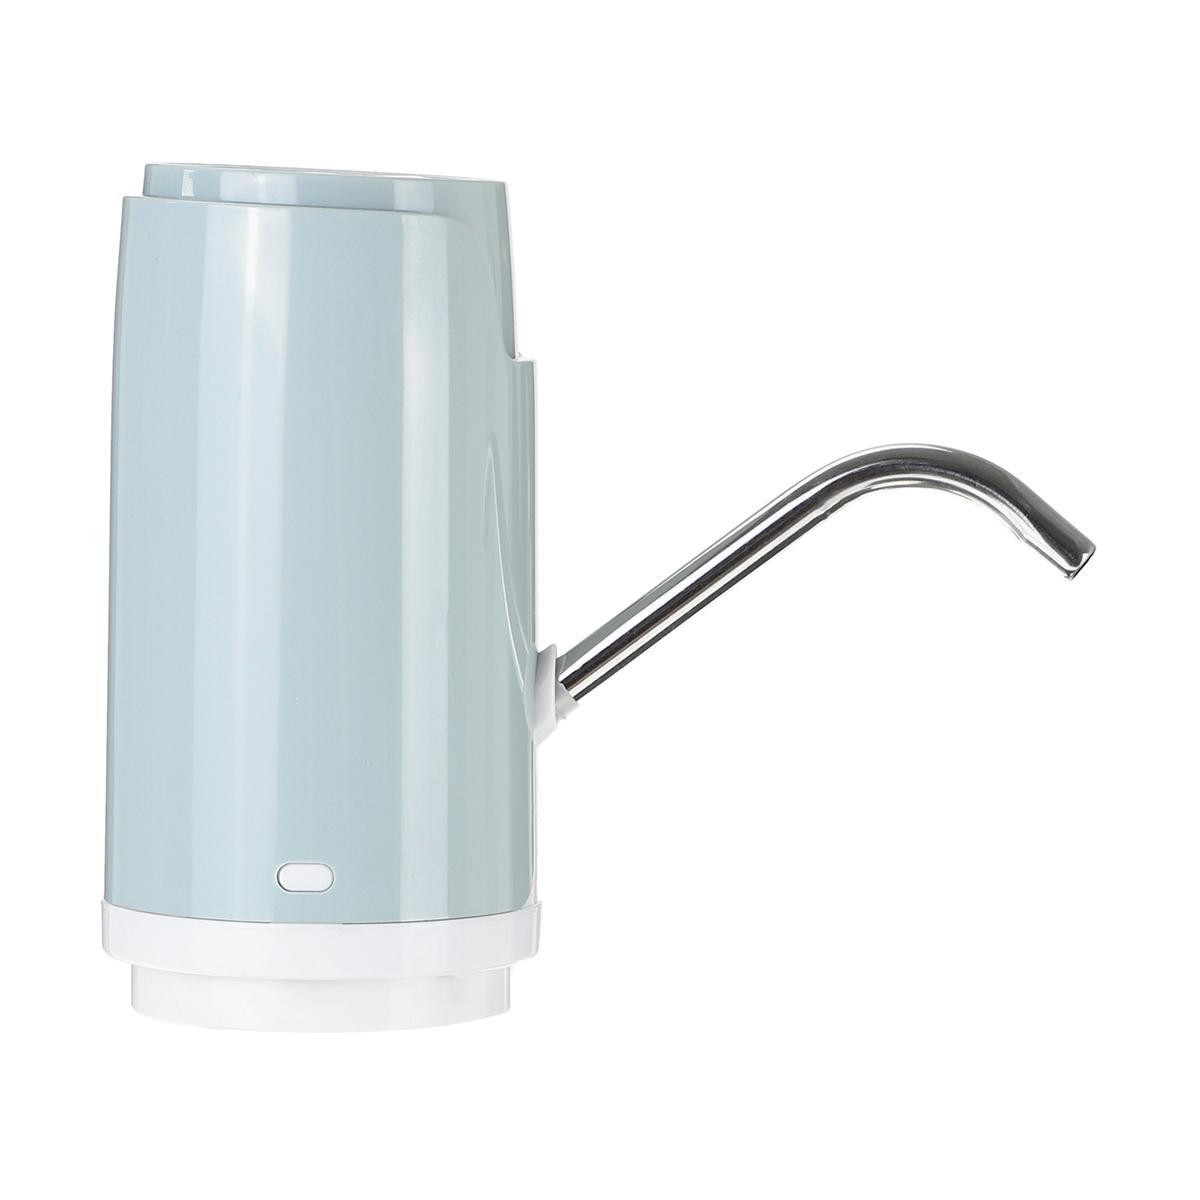 USB Rechargeable Water Pump Dispenser Automatic Gallon Bottle Pump Electric Drinking Machine Pump